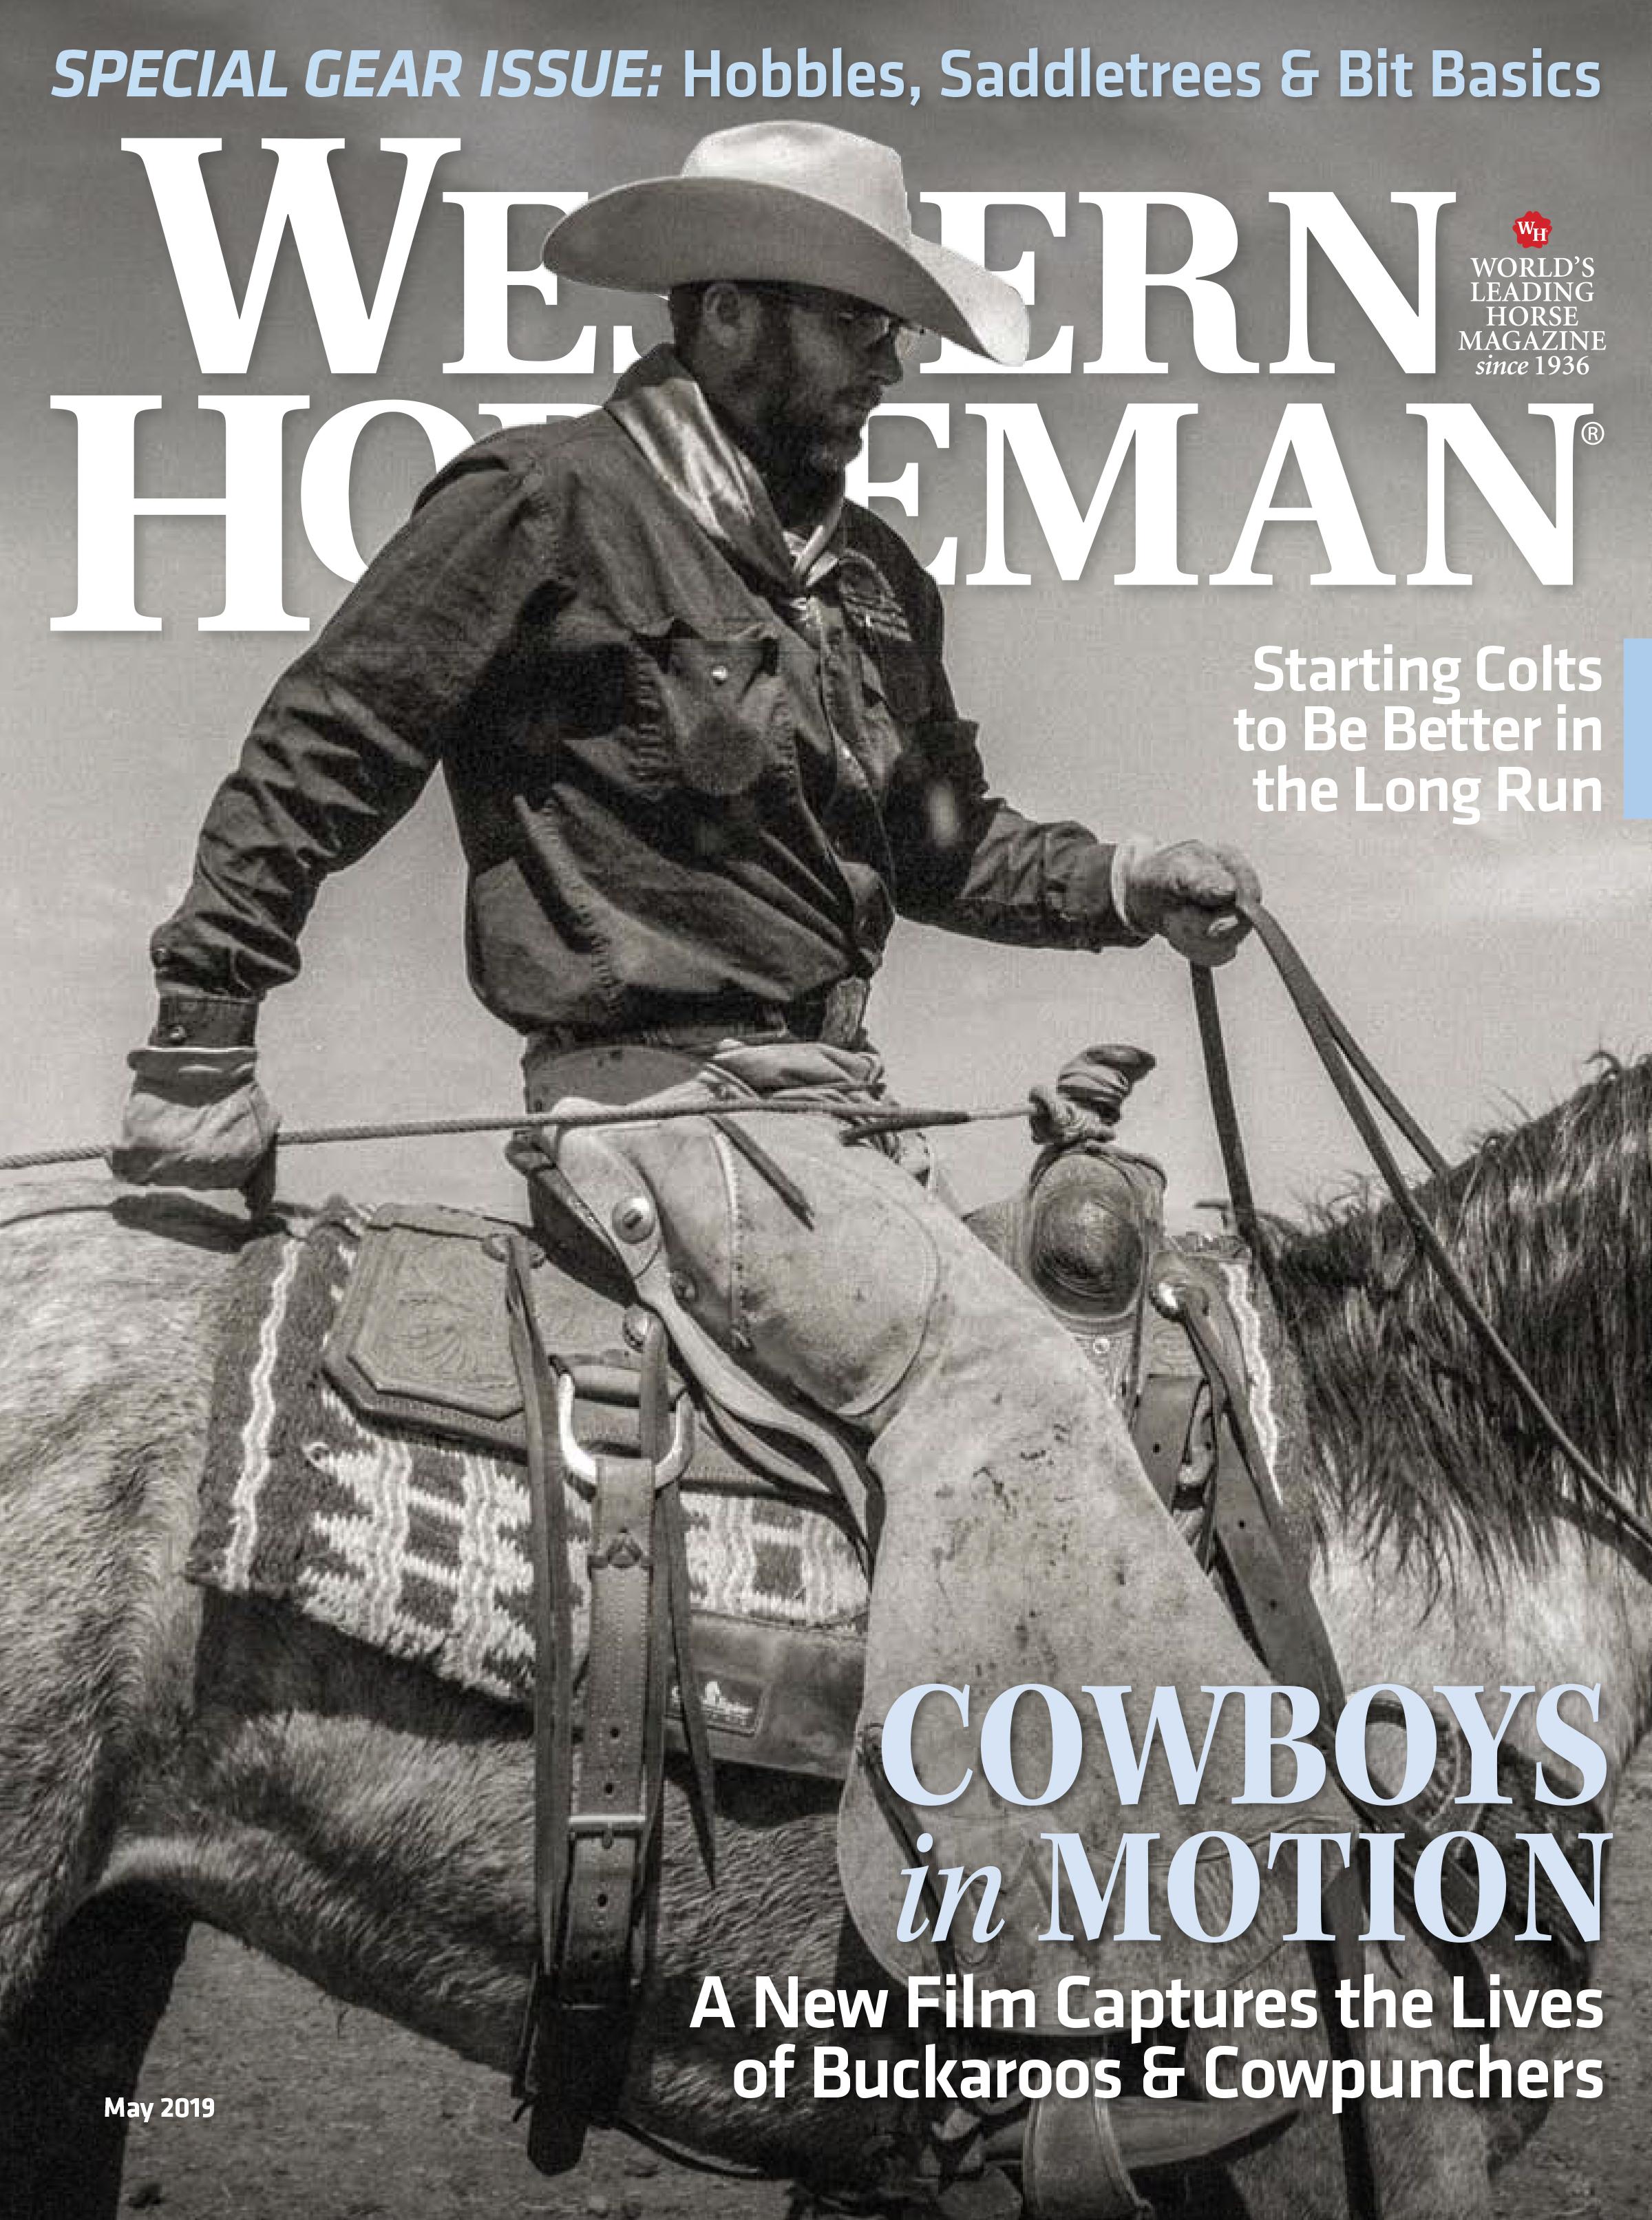 WesternHorseman_Cover_WesternHorseman_CowboysDocumentary_1922Films_BudForce_JohnLangmore.jpg